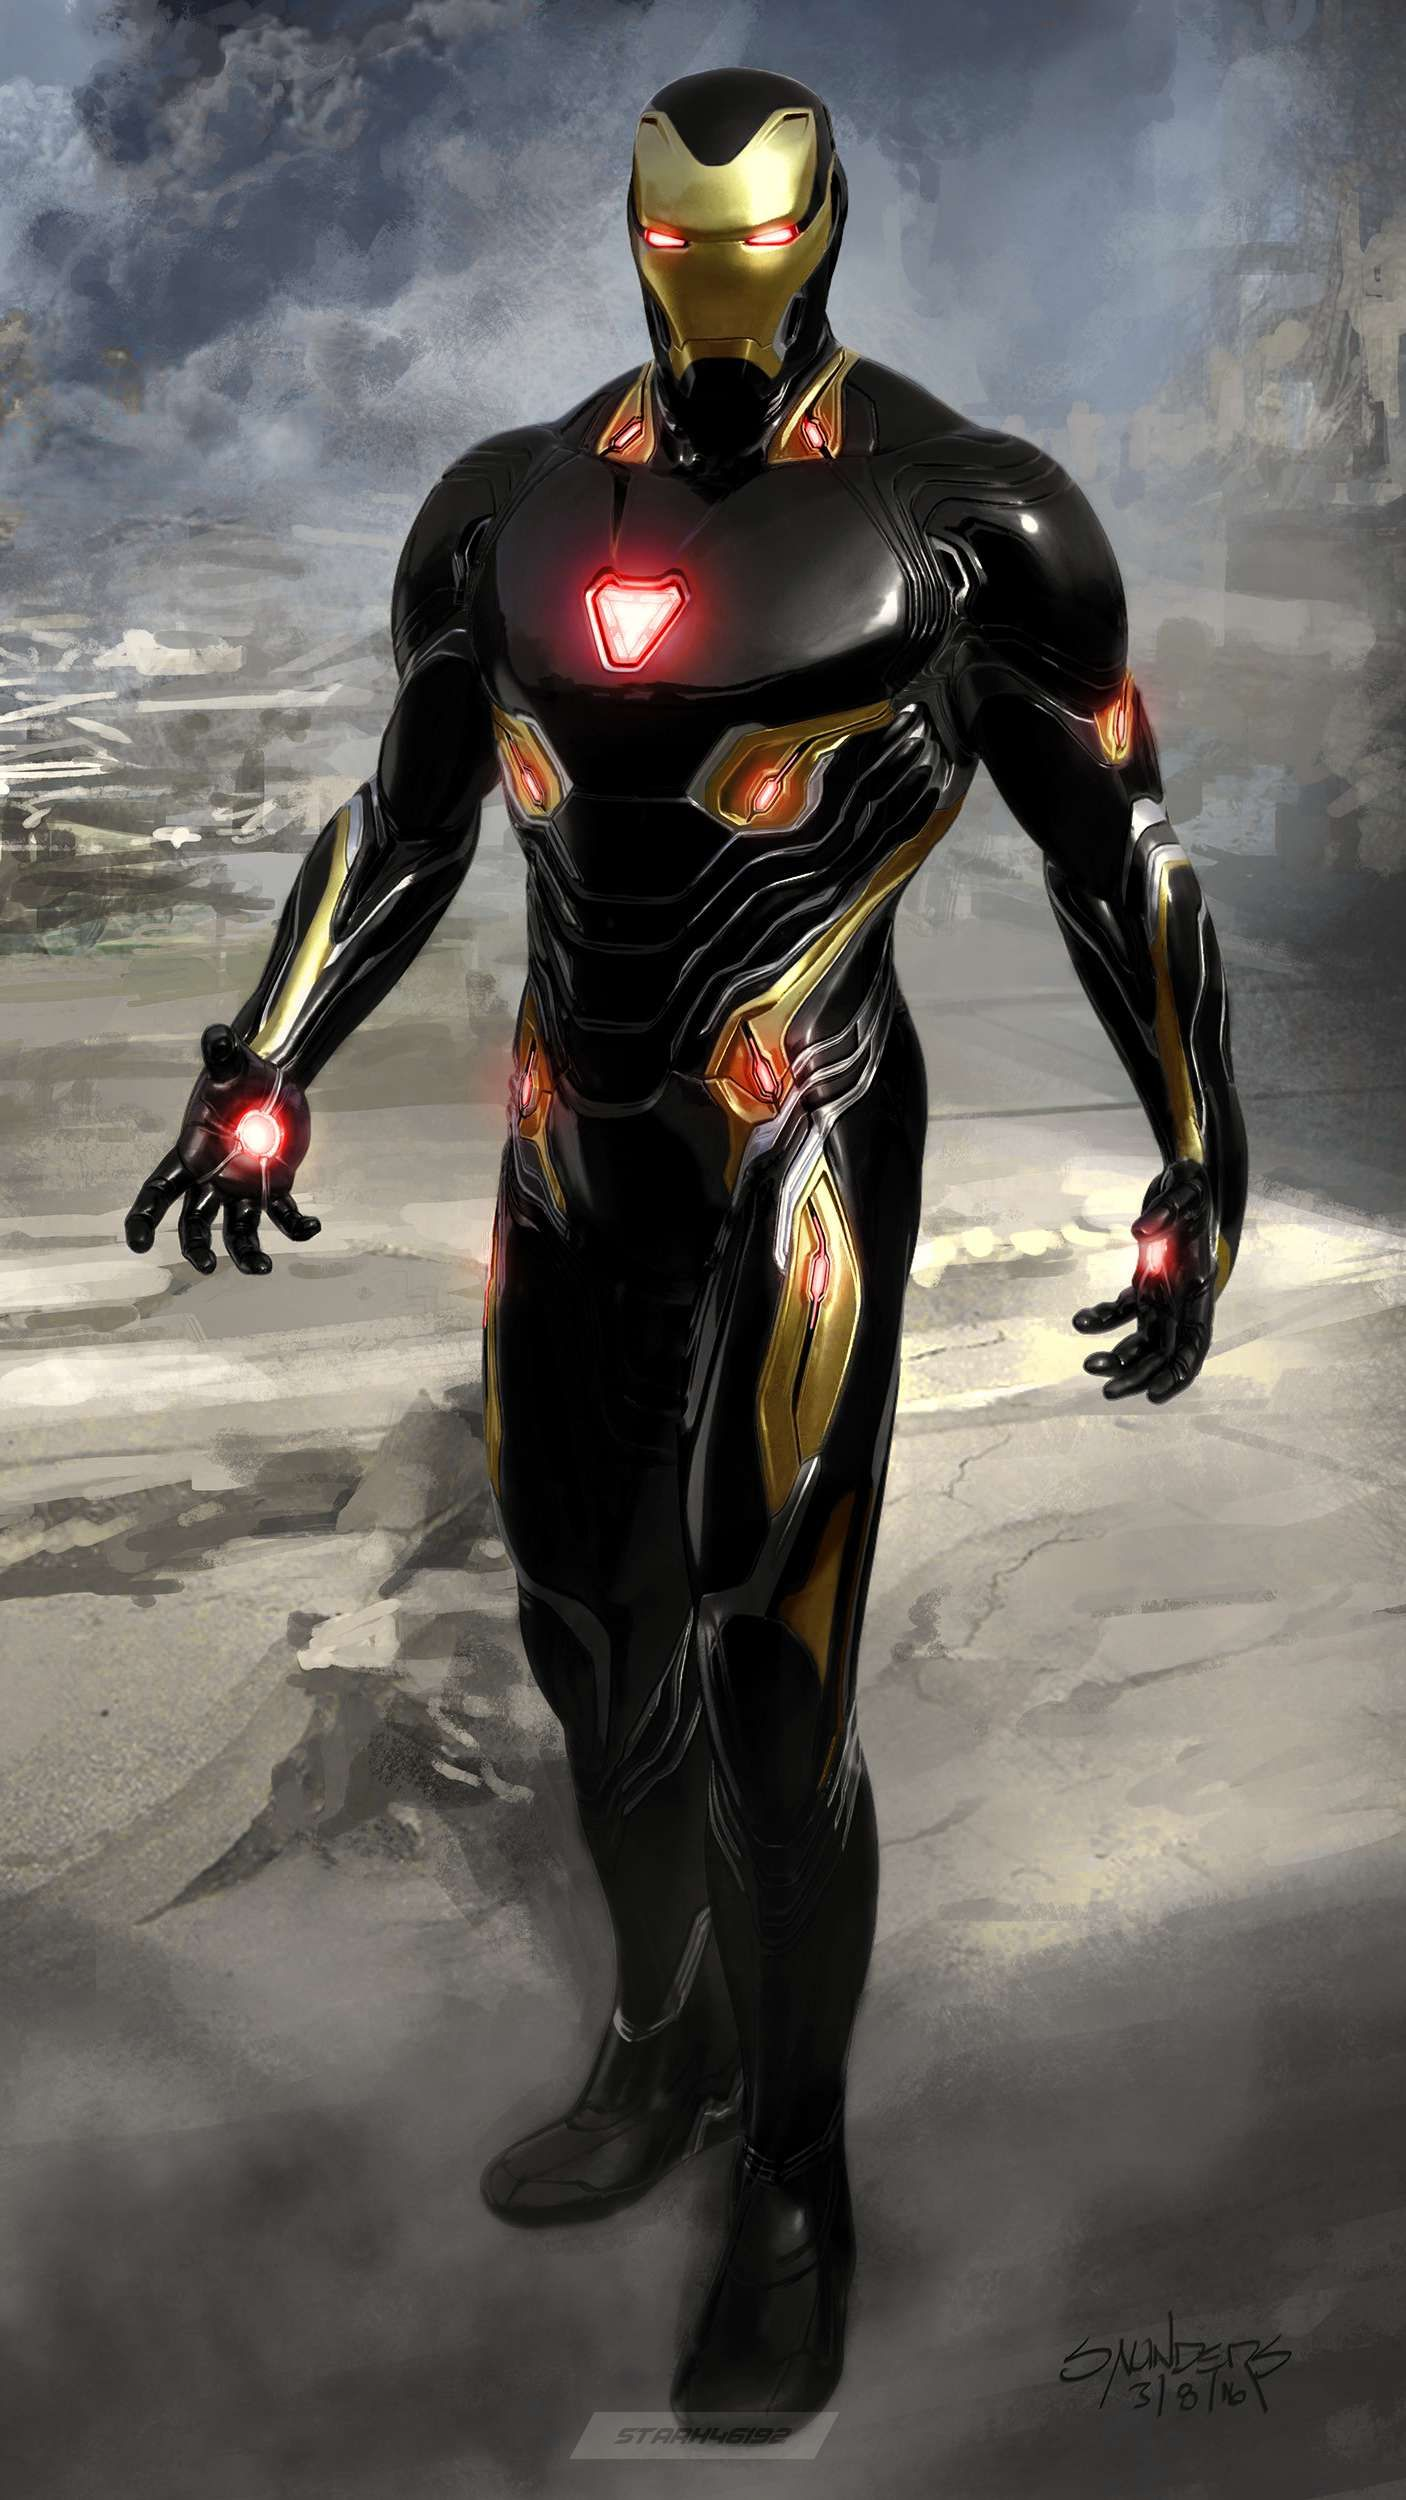 Black Armor Iron Man Iphone Wallpaper Iphone Wallpapers Iphone Wallpapers Iron Man Avengers Iron Man Armor Iron Man Art